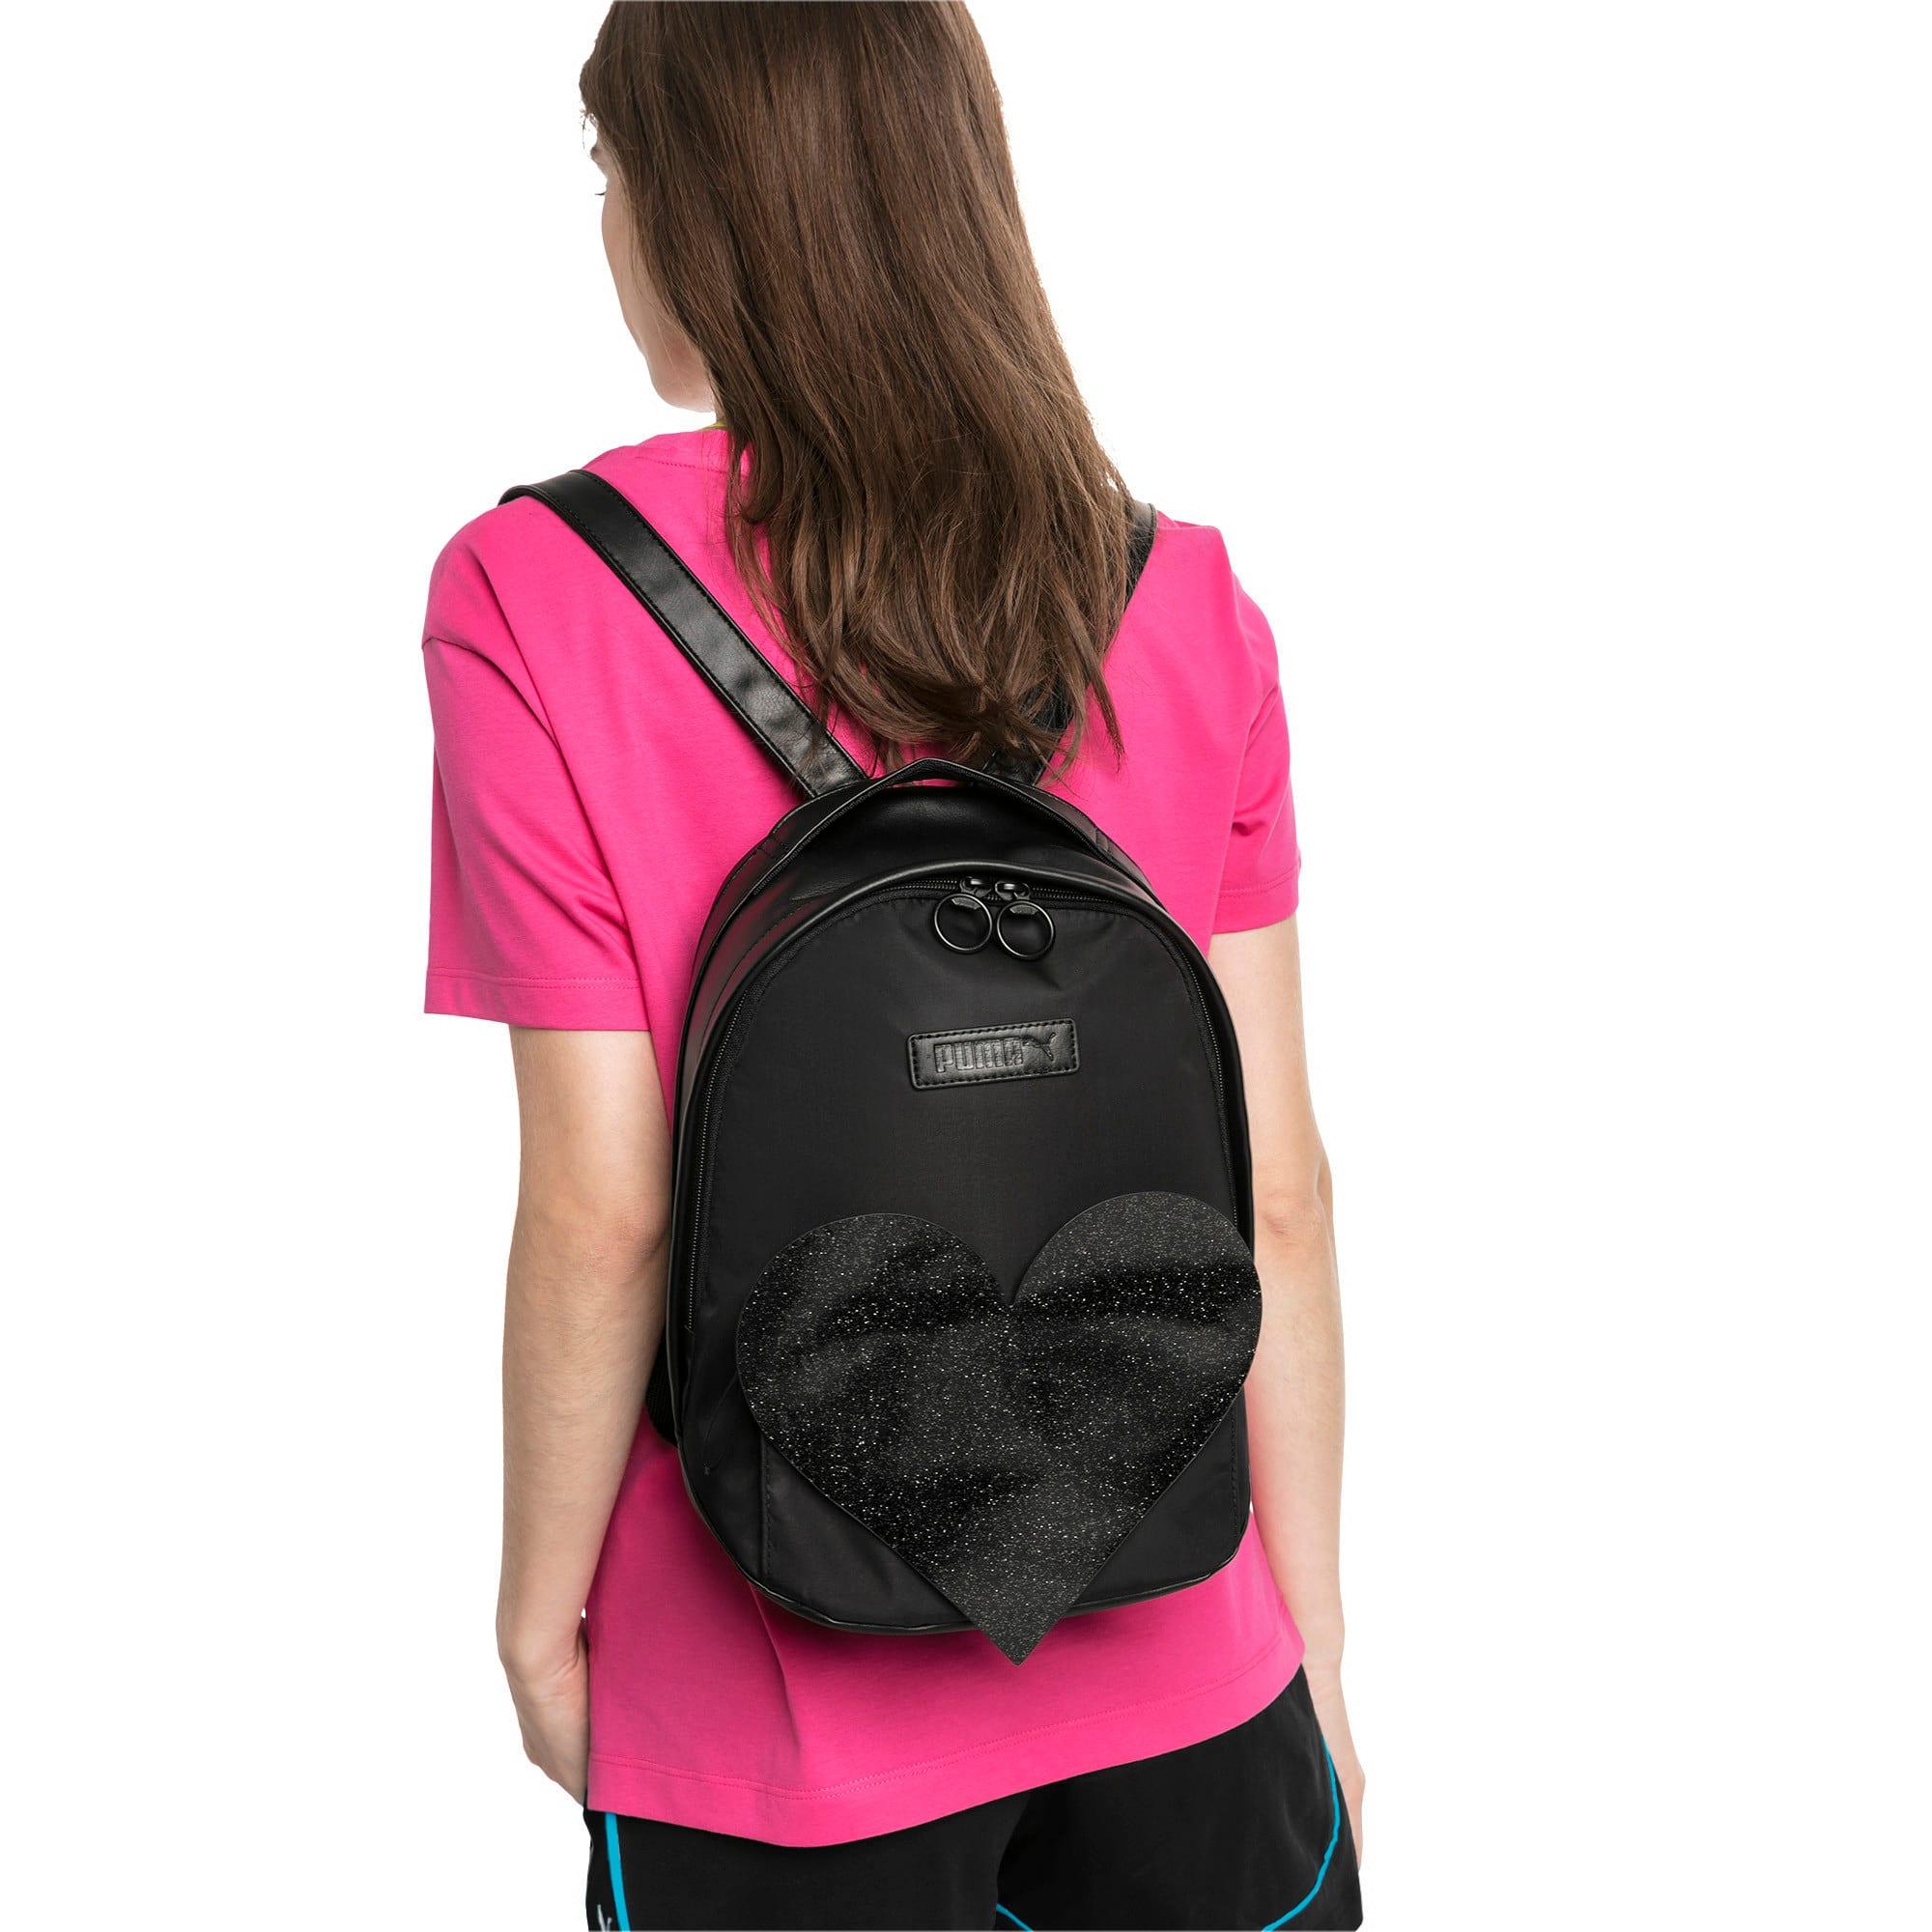 Thumbnail 2 of Prime Archive Valentine Backpack, Puma Black, medium